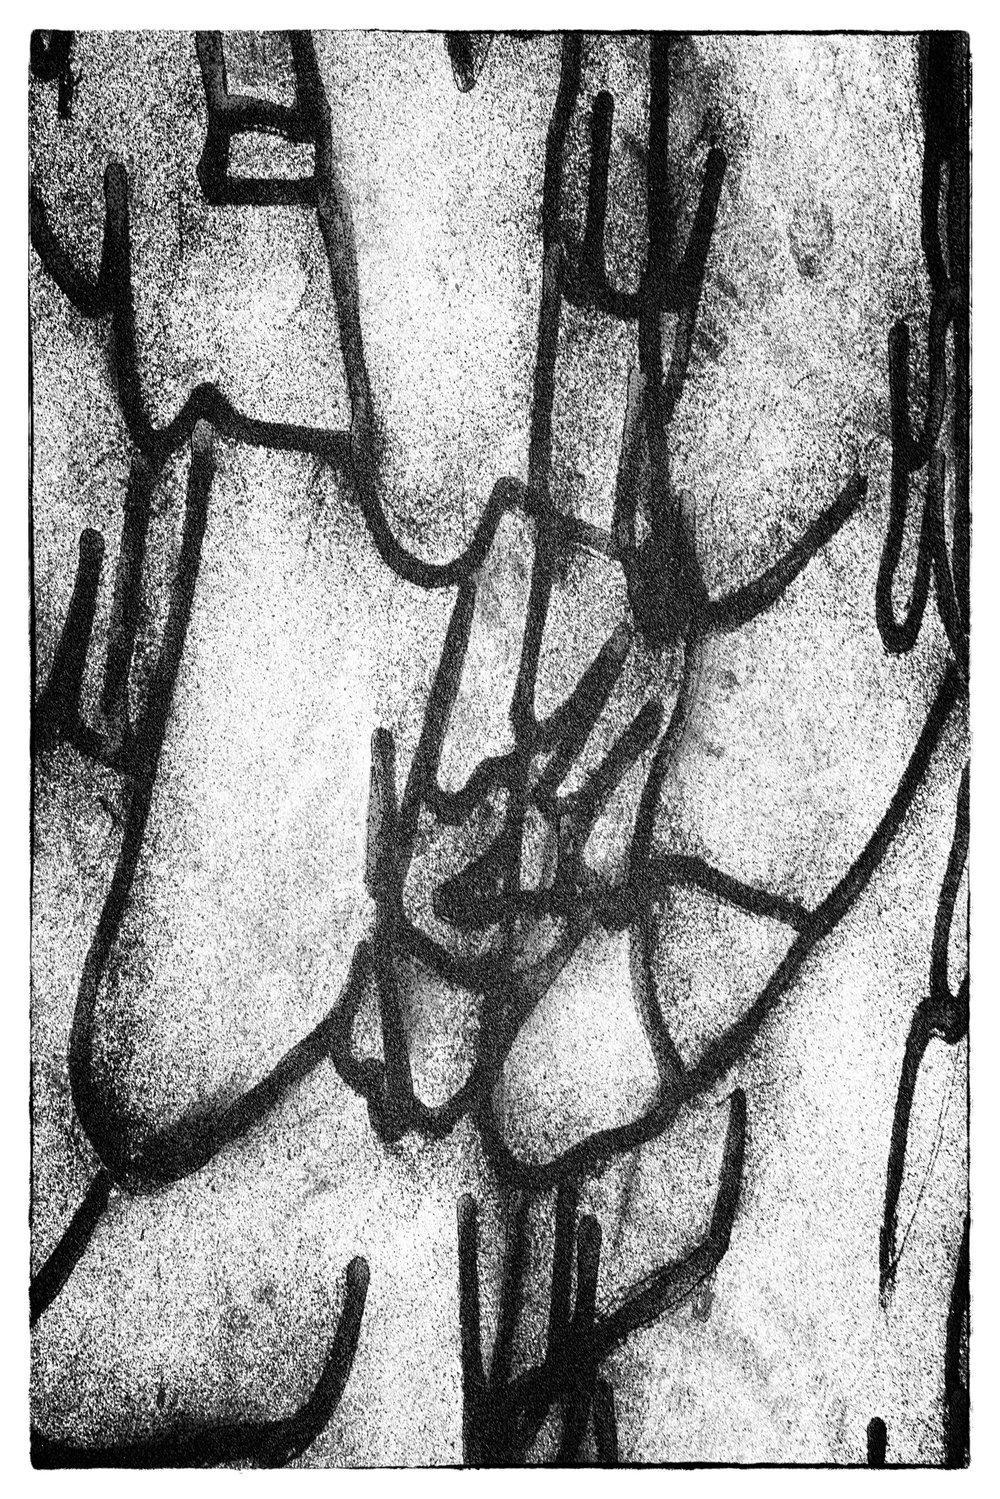 Asphalt # 8